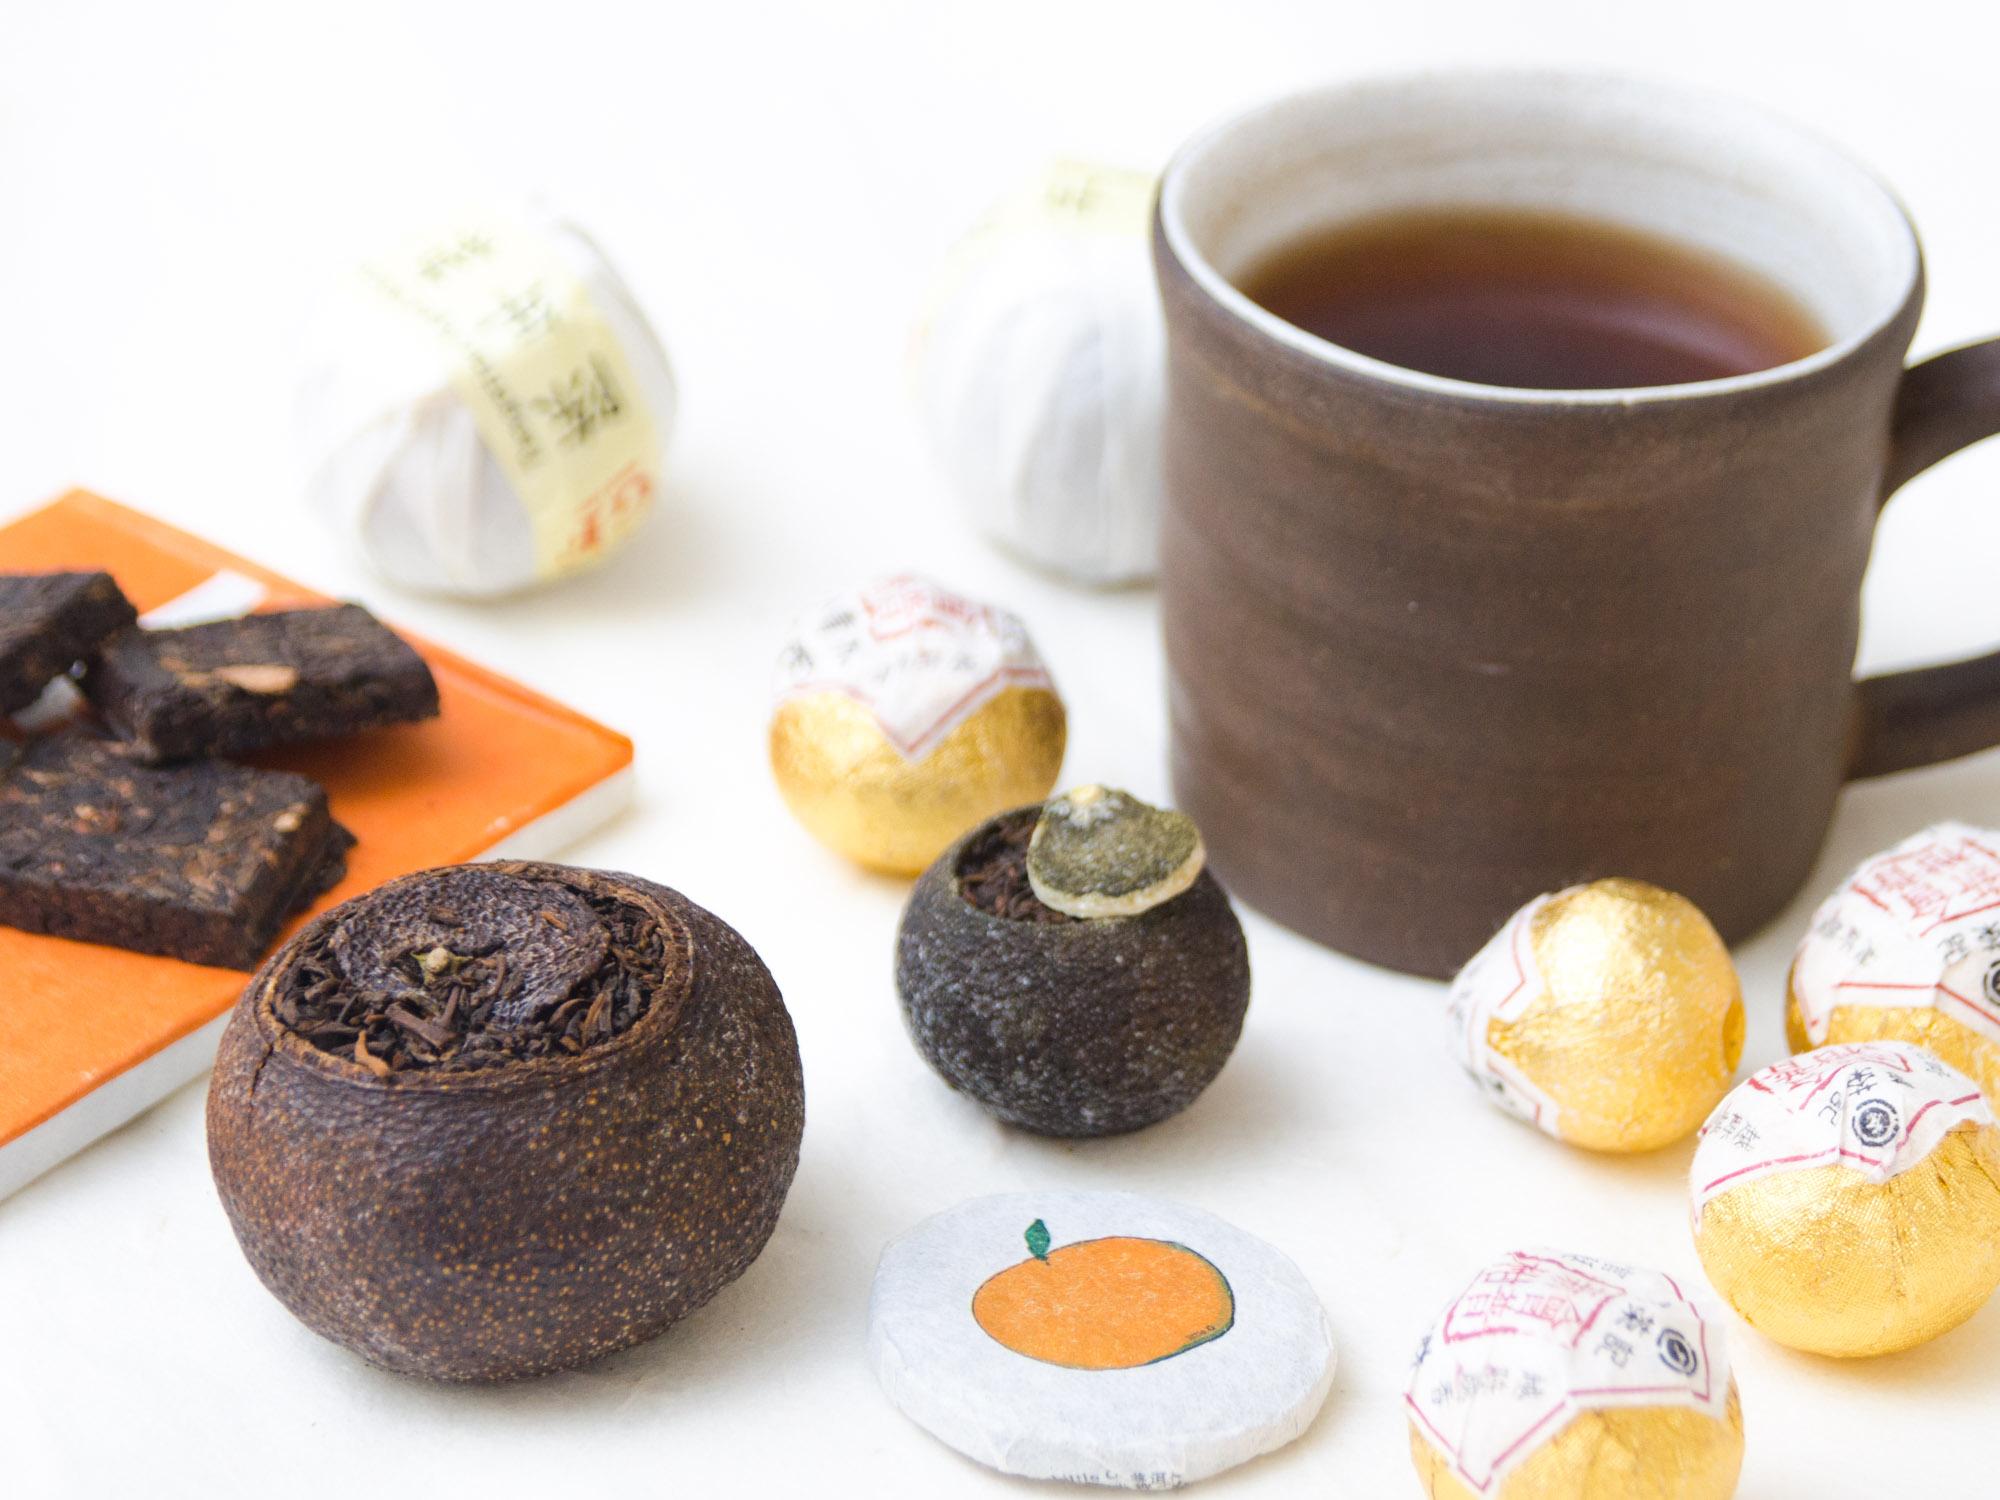 chenpi-puer-tea-falkowitz-1.jpg